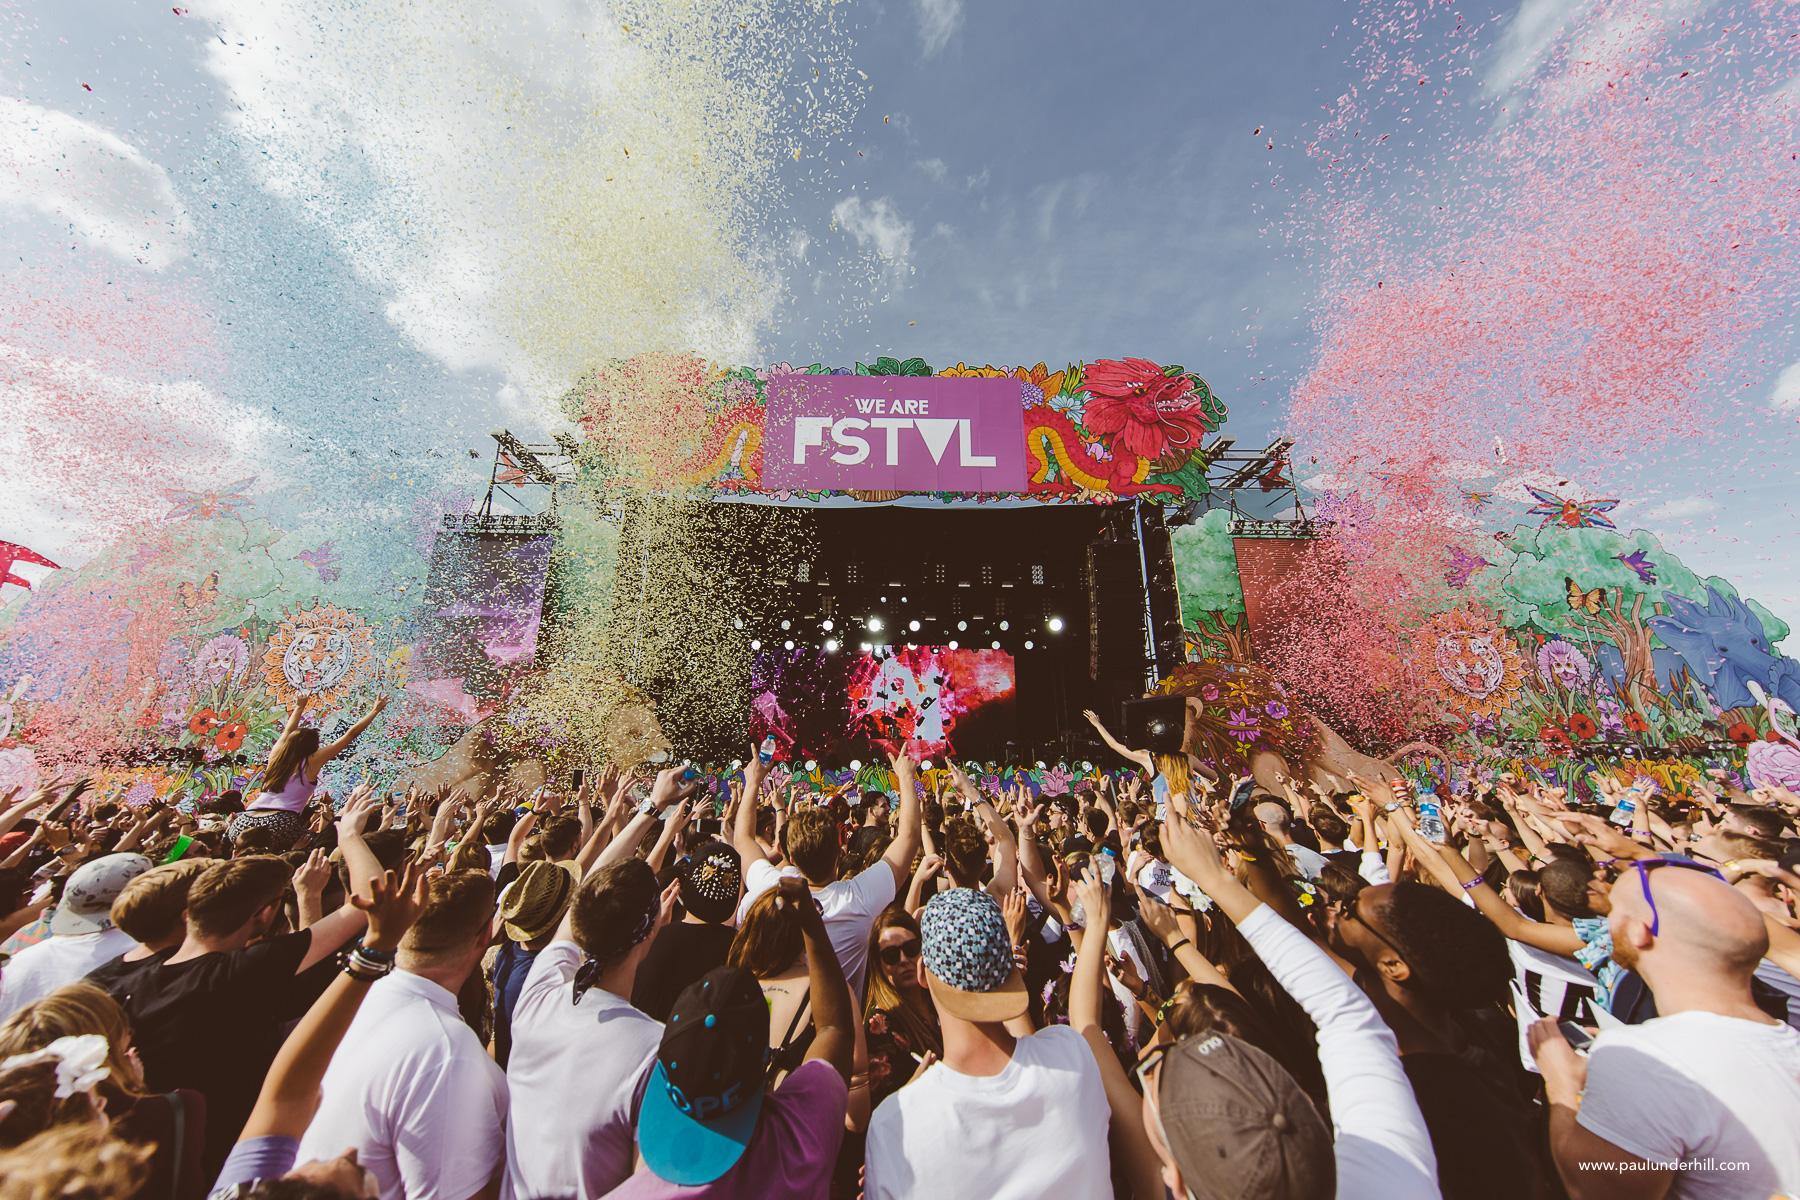 Lifestyle-photography-music-festivals-00011